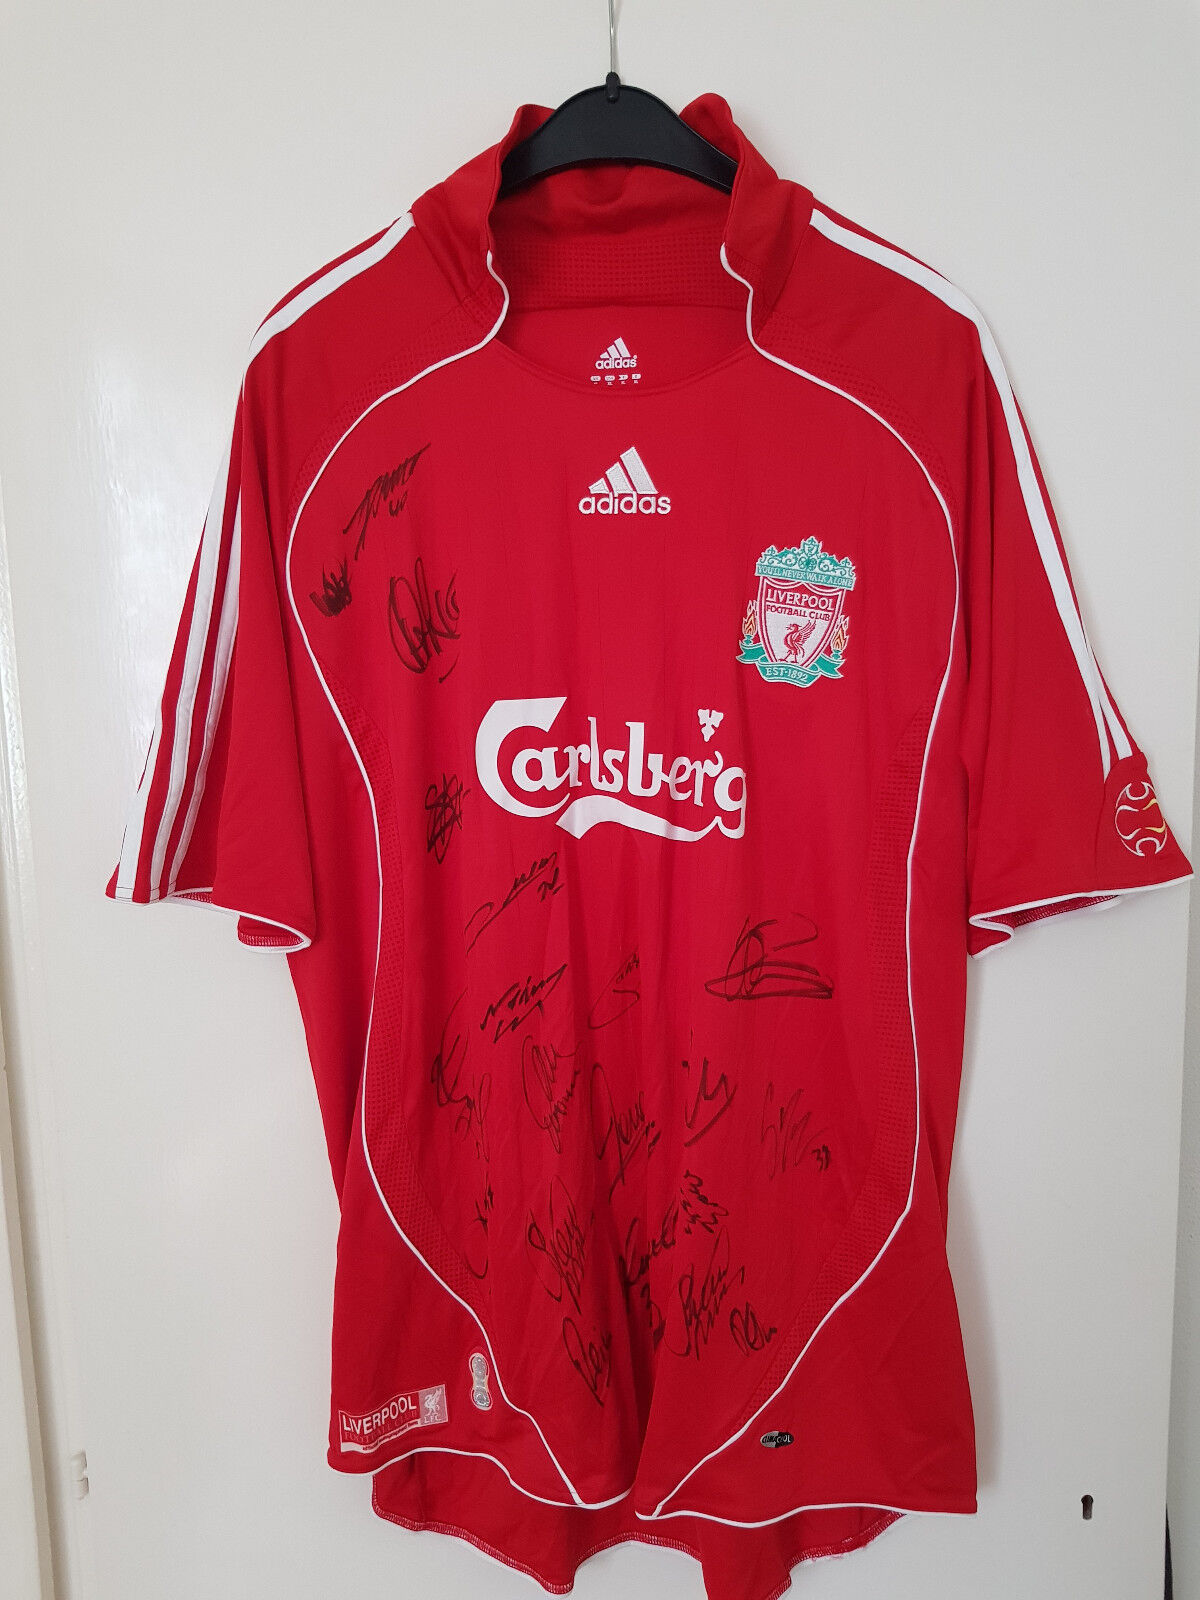 Official Home Shirt Liverpool FC 2007 08 Squad Signed inc.Gerrard Kuyt Carragher